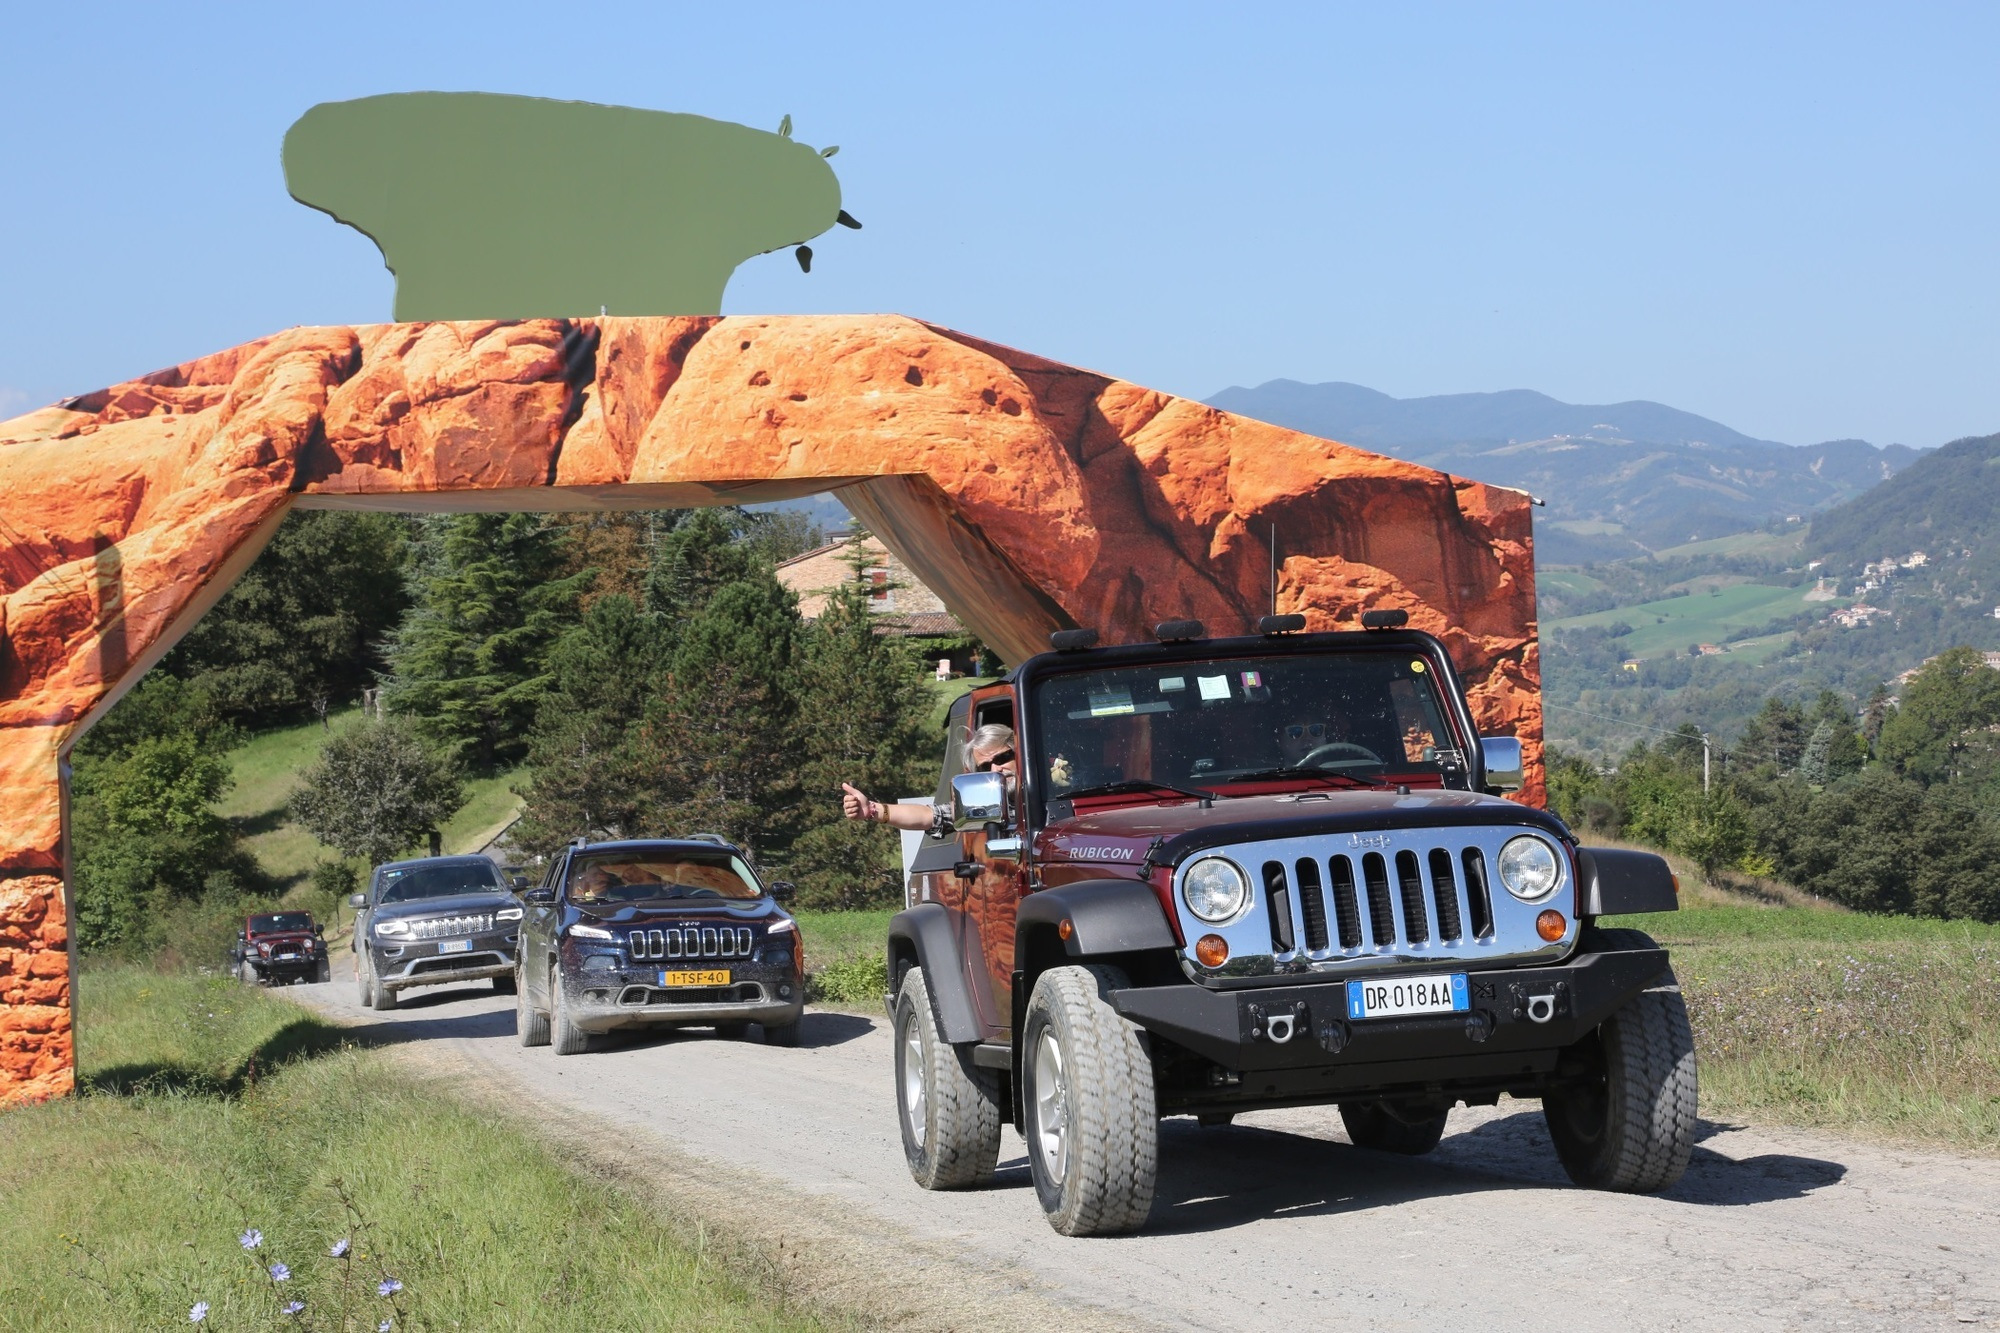 Jeep Camp Italia - Bella figura im Gelände